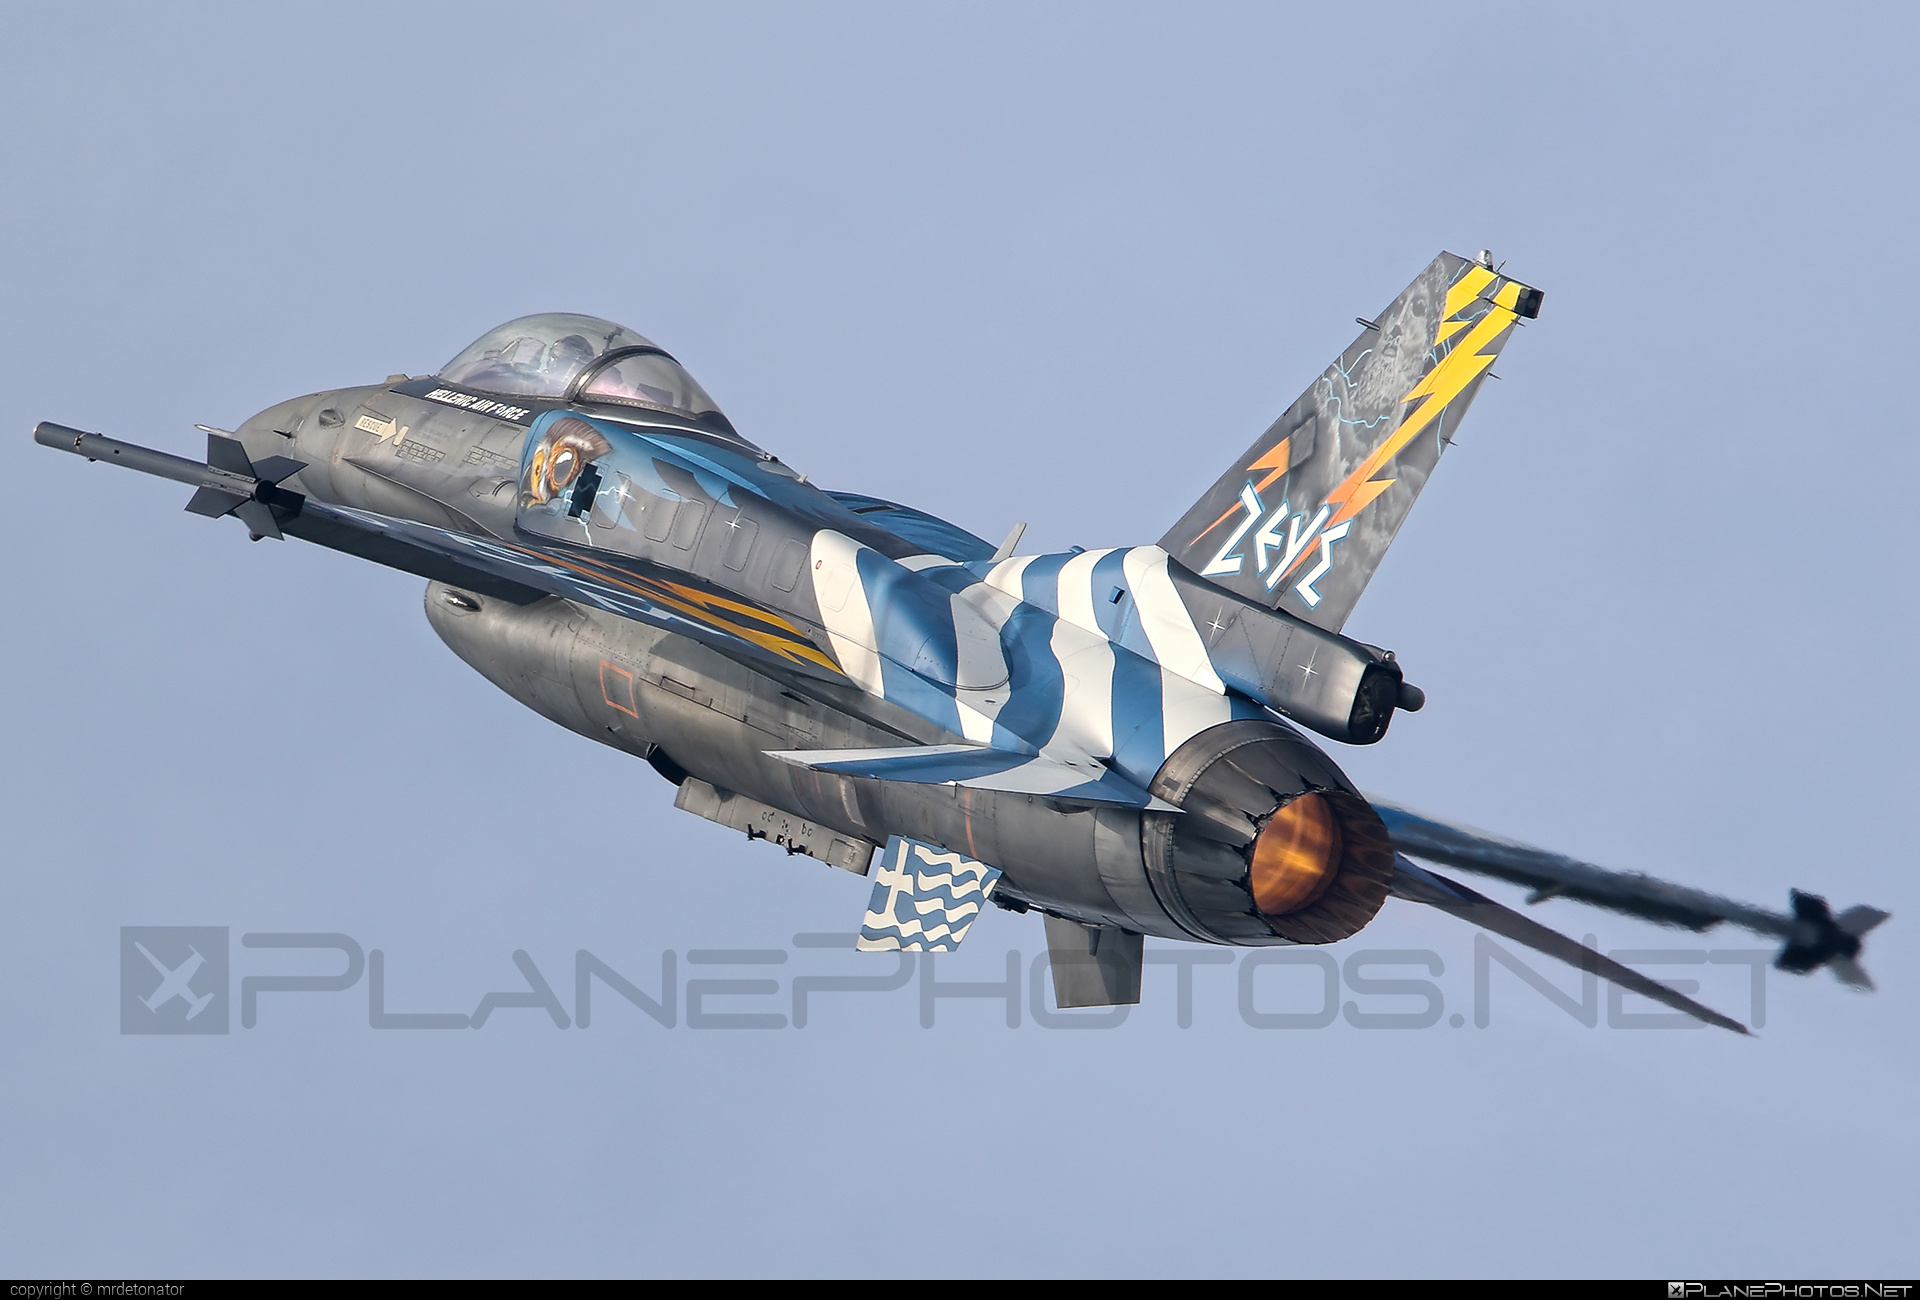 Lockheed Martin F-16CJ Fighting Falcon - 523 operated by Polemikí Aeroporía (Hellenic Air Force) #LockheedMartin #f16 #f16cj #fightingfalcon #hellenicairforce #natodays #natodays2015 #polemikiaeroporia